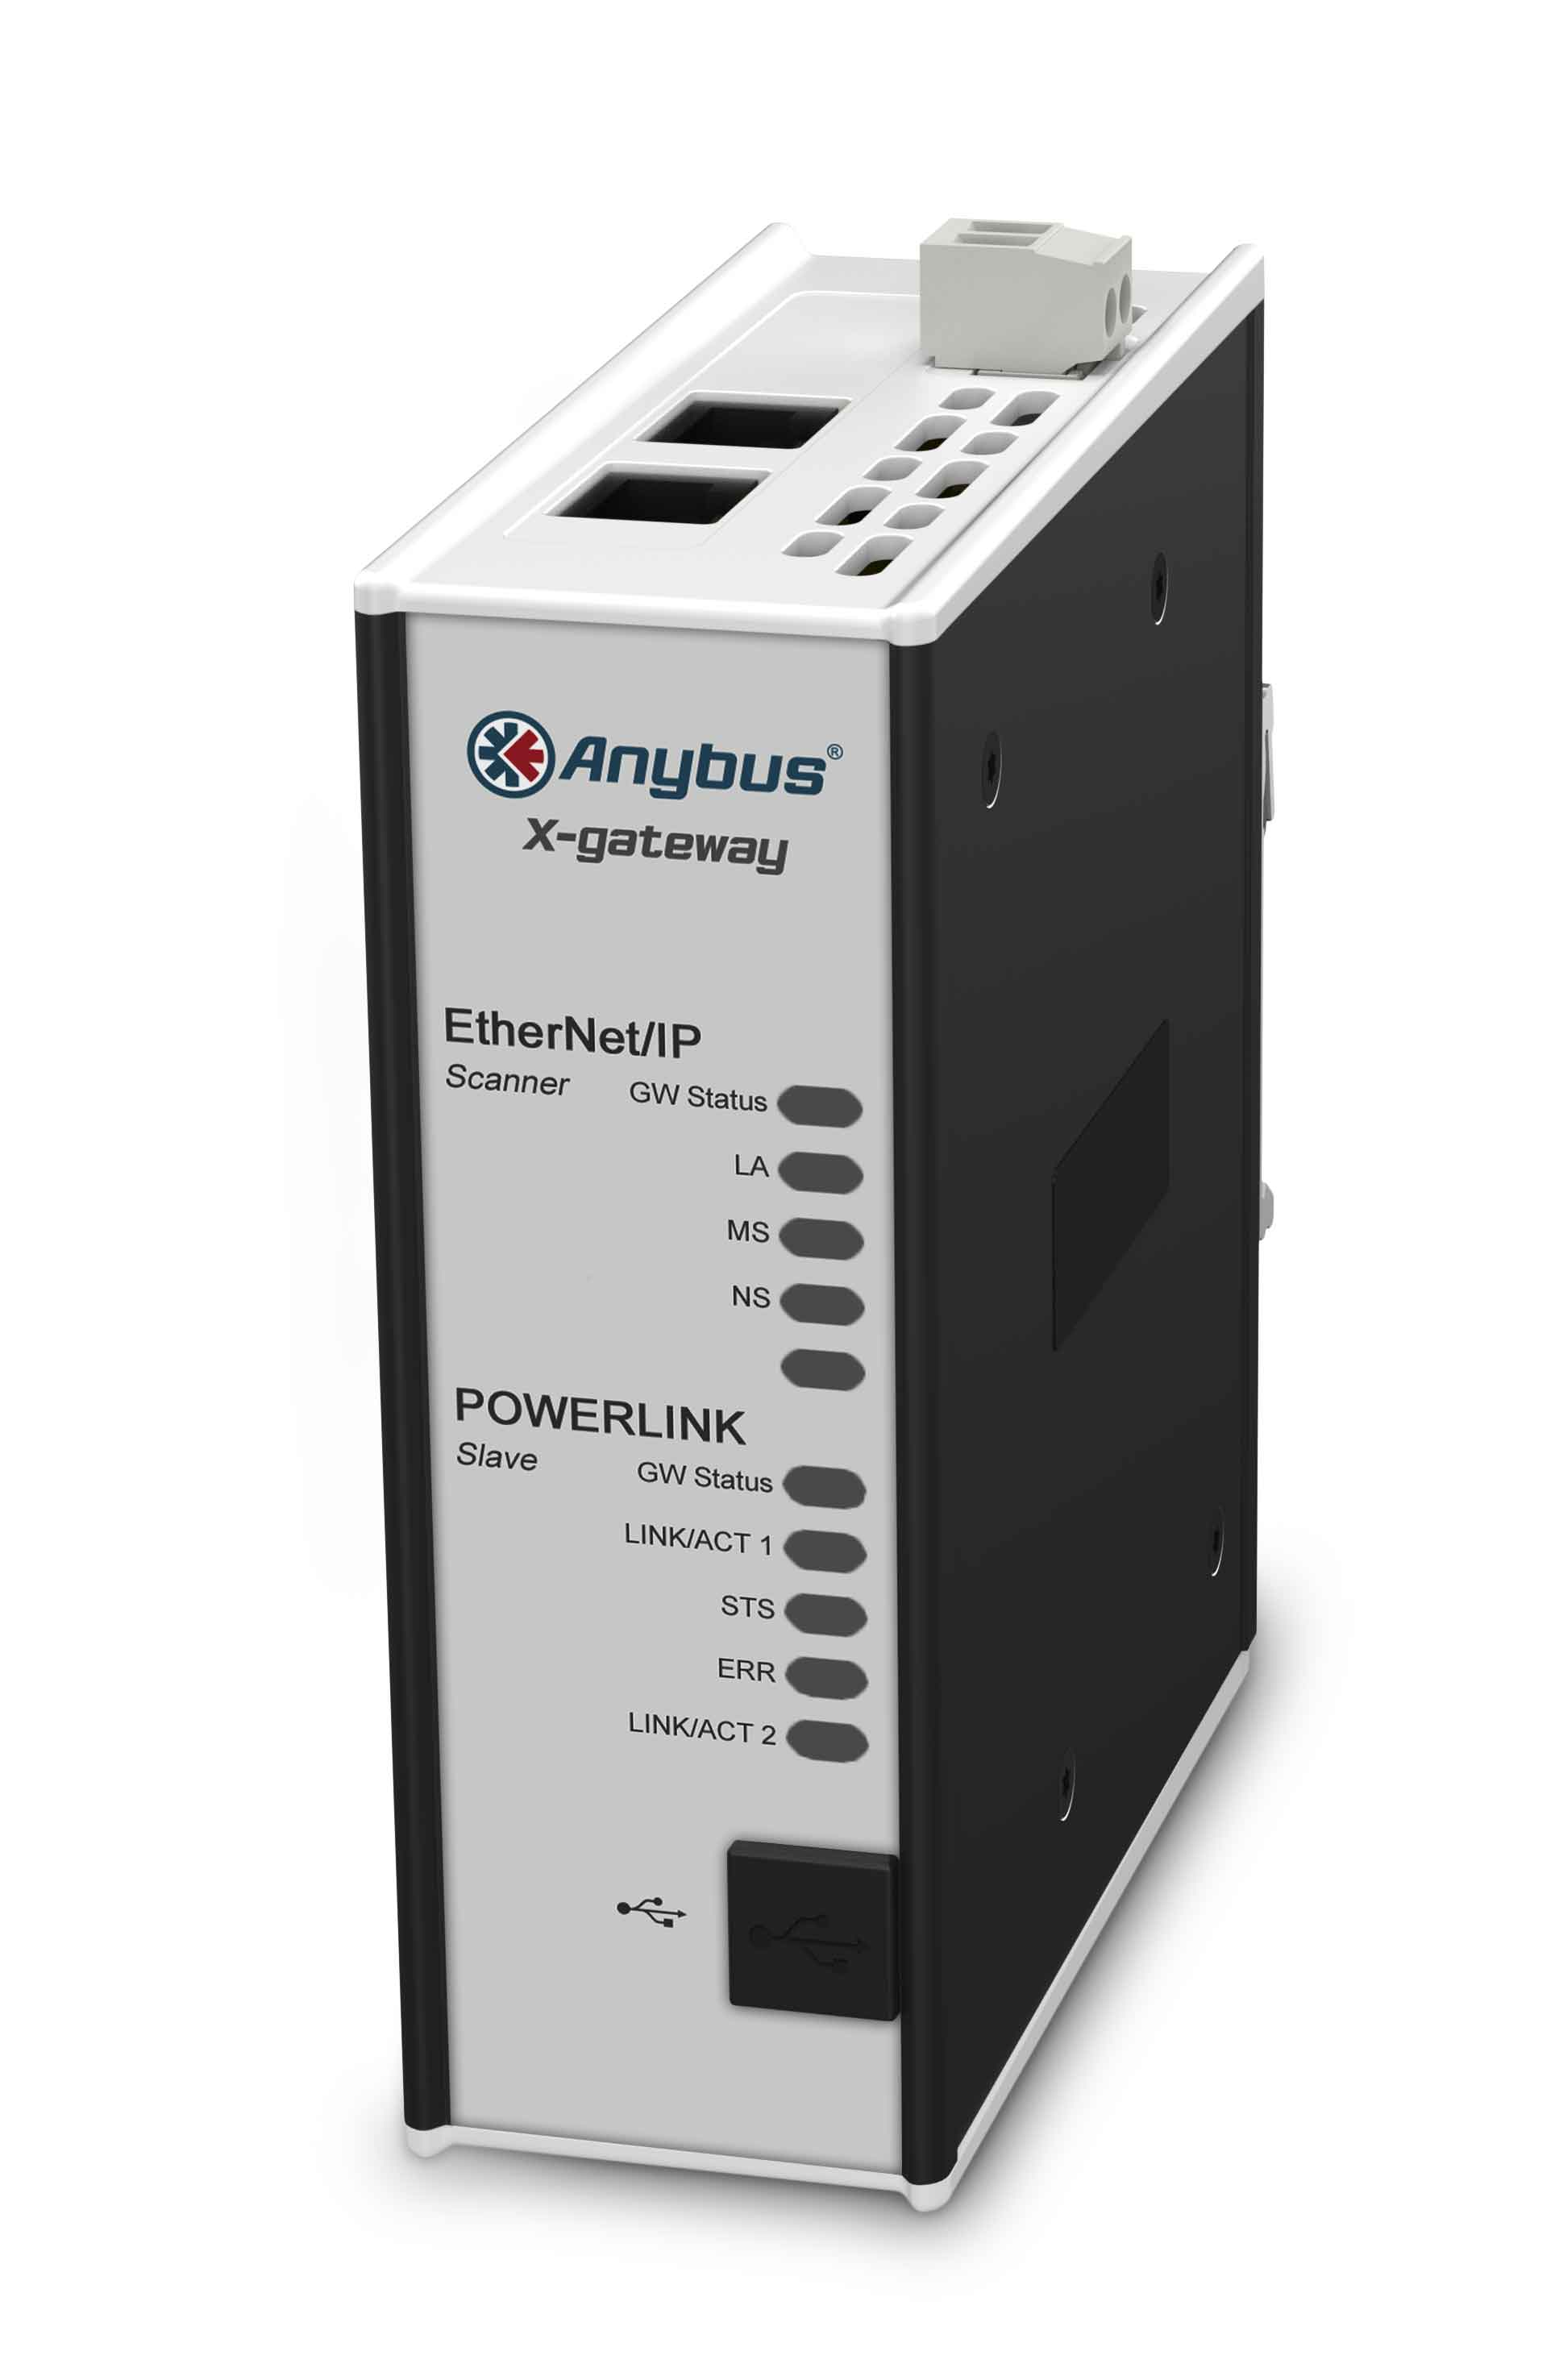 EtherNet/IP Scanner - POWERLINK Device - AB7524-F